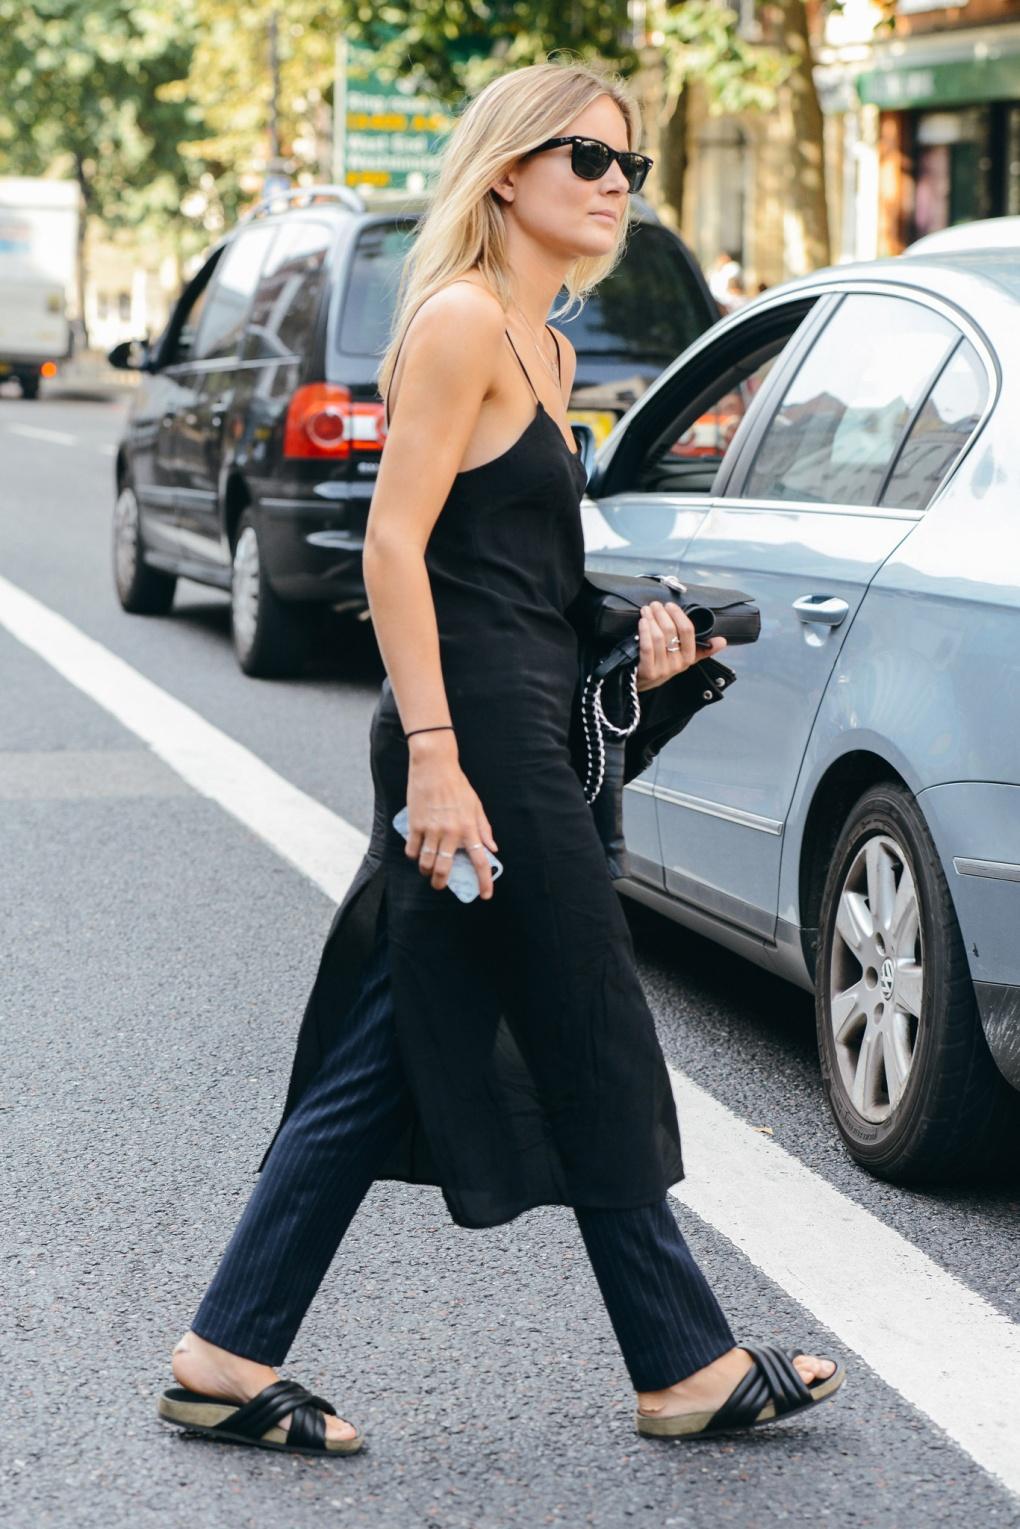 street-style-dress-over-pants-layering-5.jpg